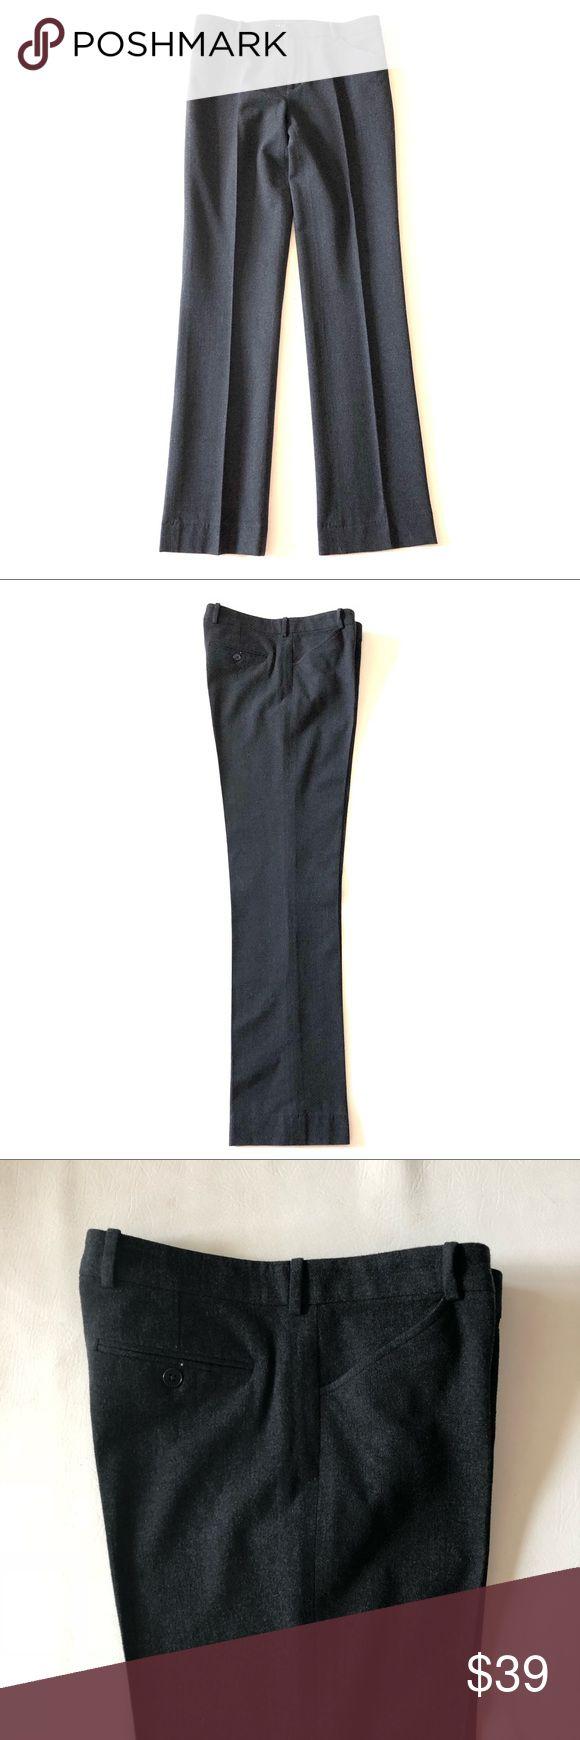 "Ralph Lauren gray wool pants 4 Ralph Lauren gray wool pants 4 Size 4 Waist 31"" Inseam 32"" Gray wool  Straight trouser fit Perfect condition Ralph Lauren Pants Straight Leg"